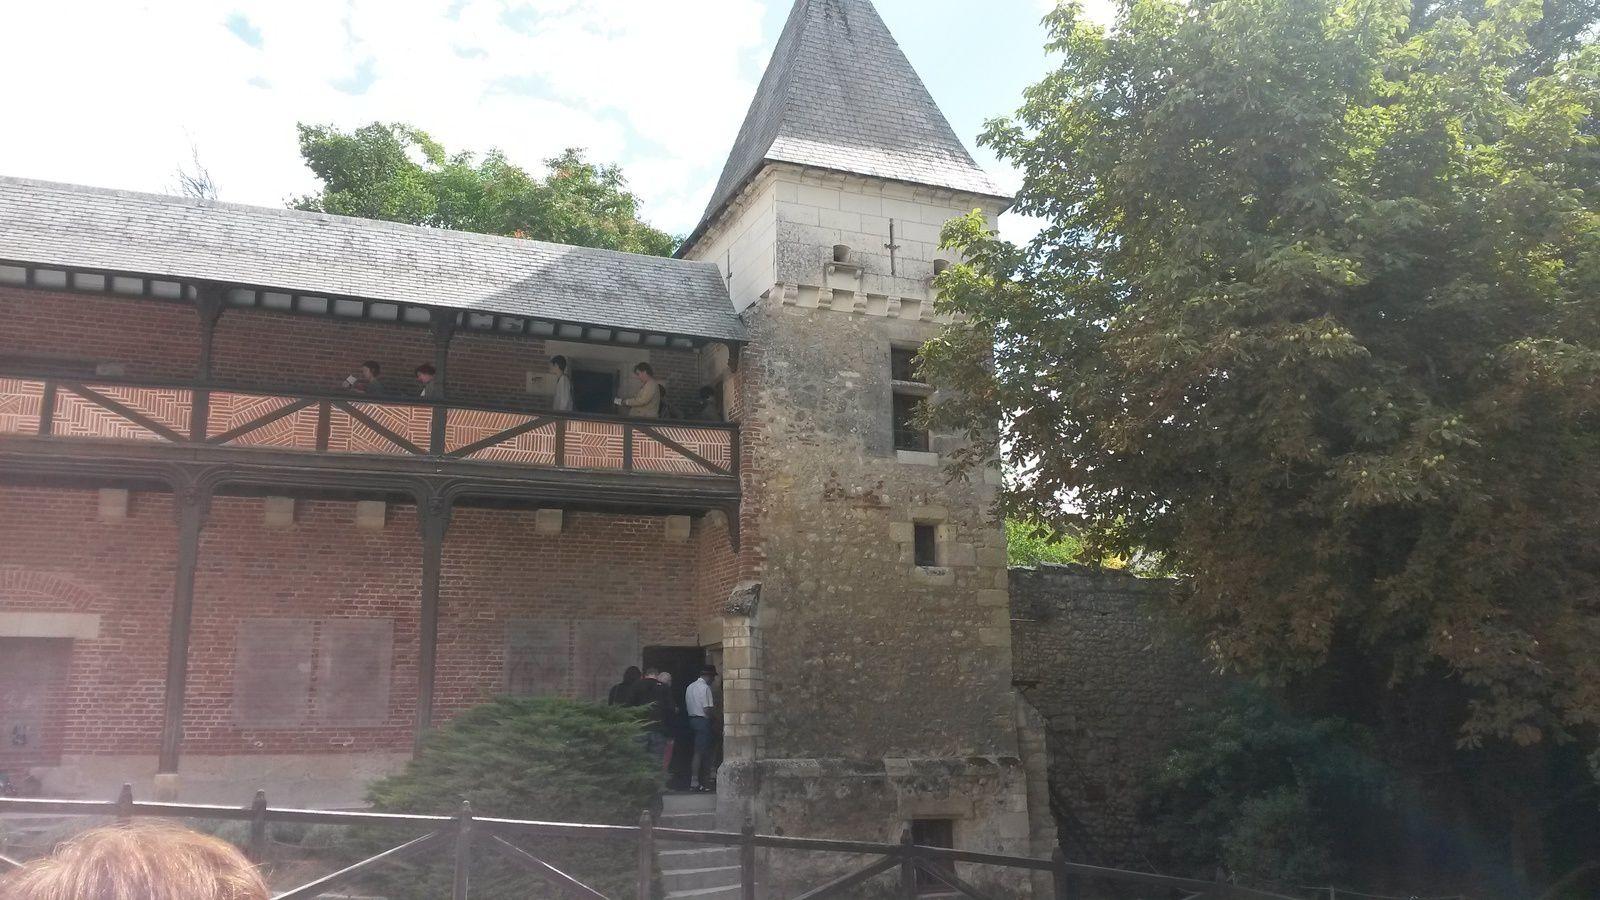 J3 : Château du Clos Lucé, Parc Leonardo da Vinci